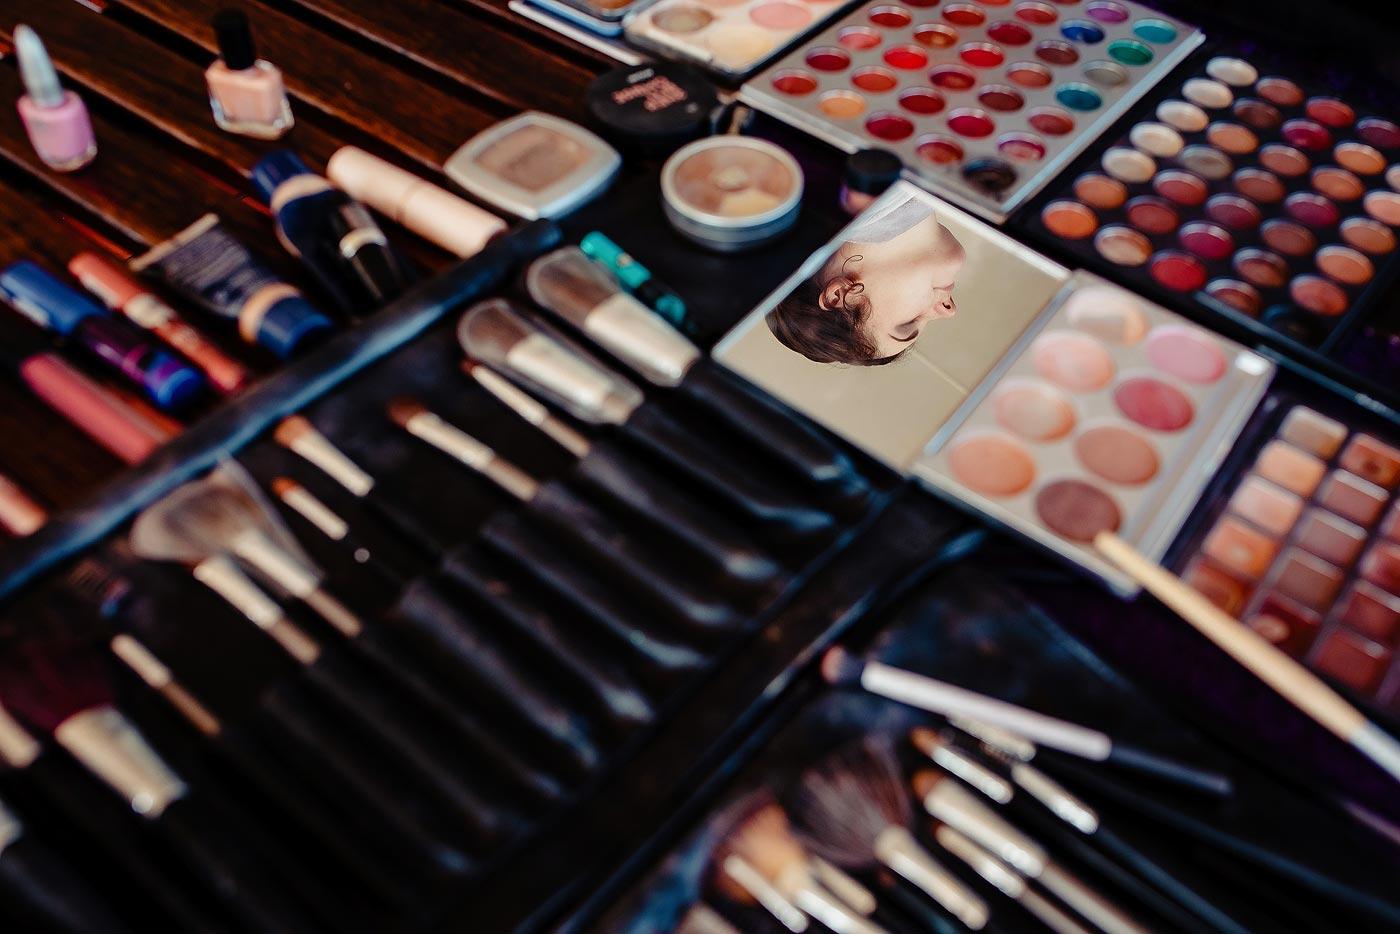 Copy of Bridal Make-up creative Moment Photo